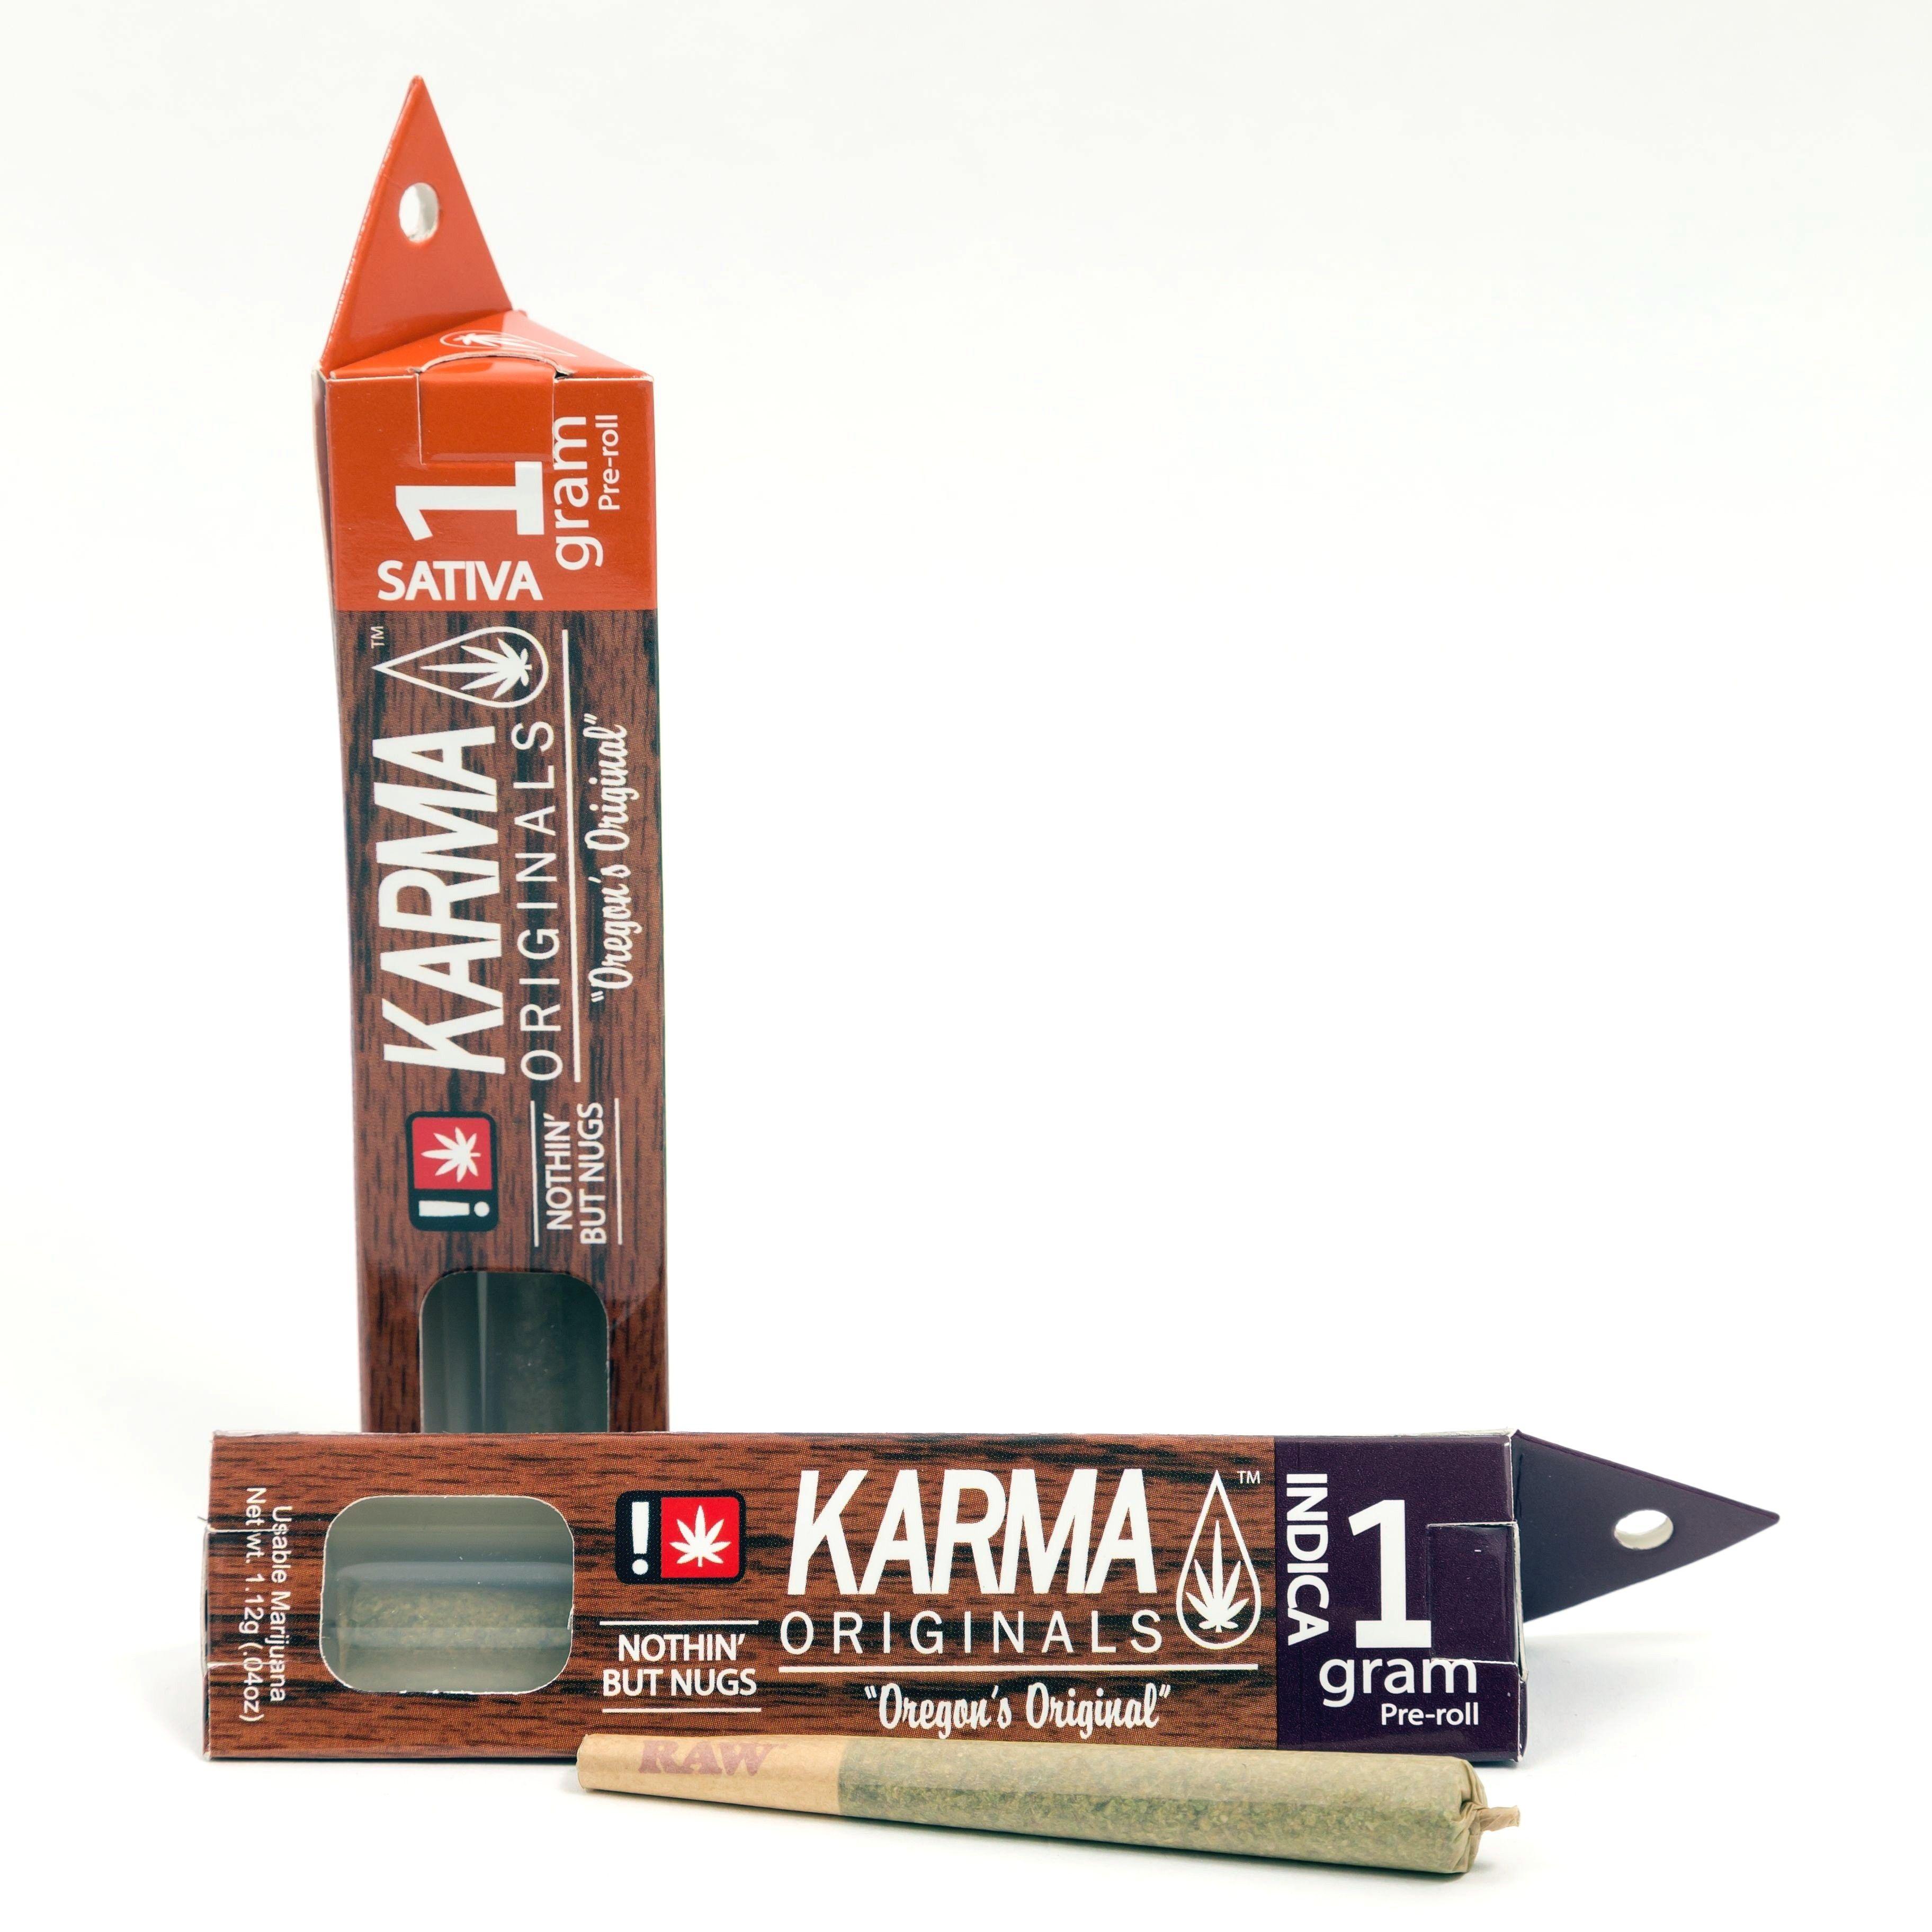 Karma Originals - Island Sweet Skunk 1g, Sativa, Pre-roll